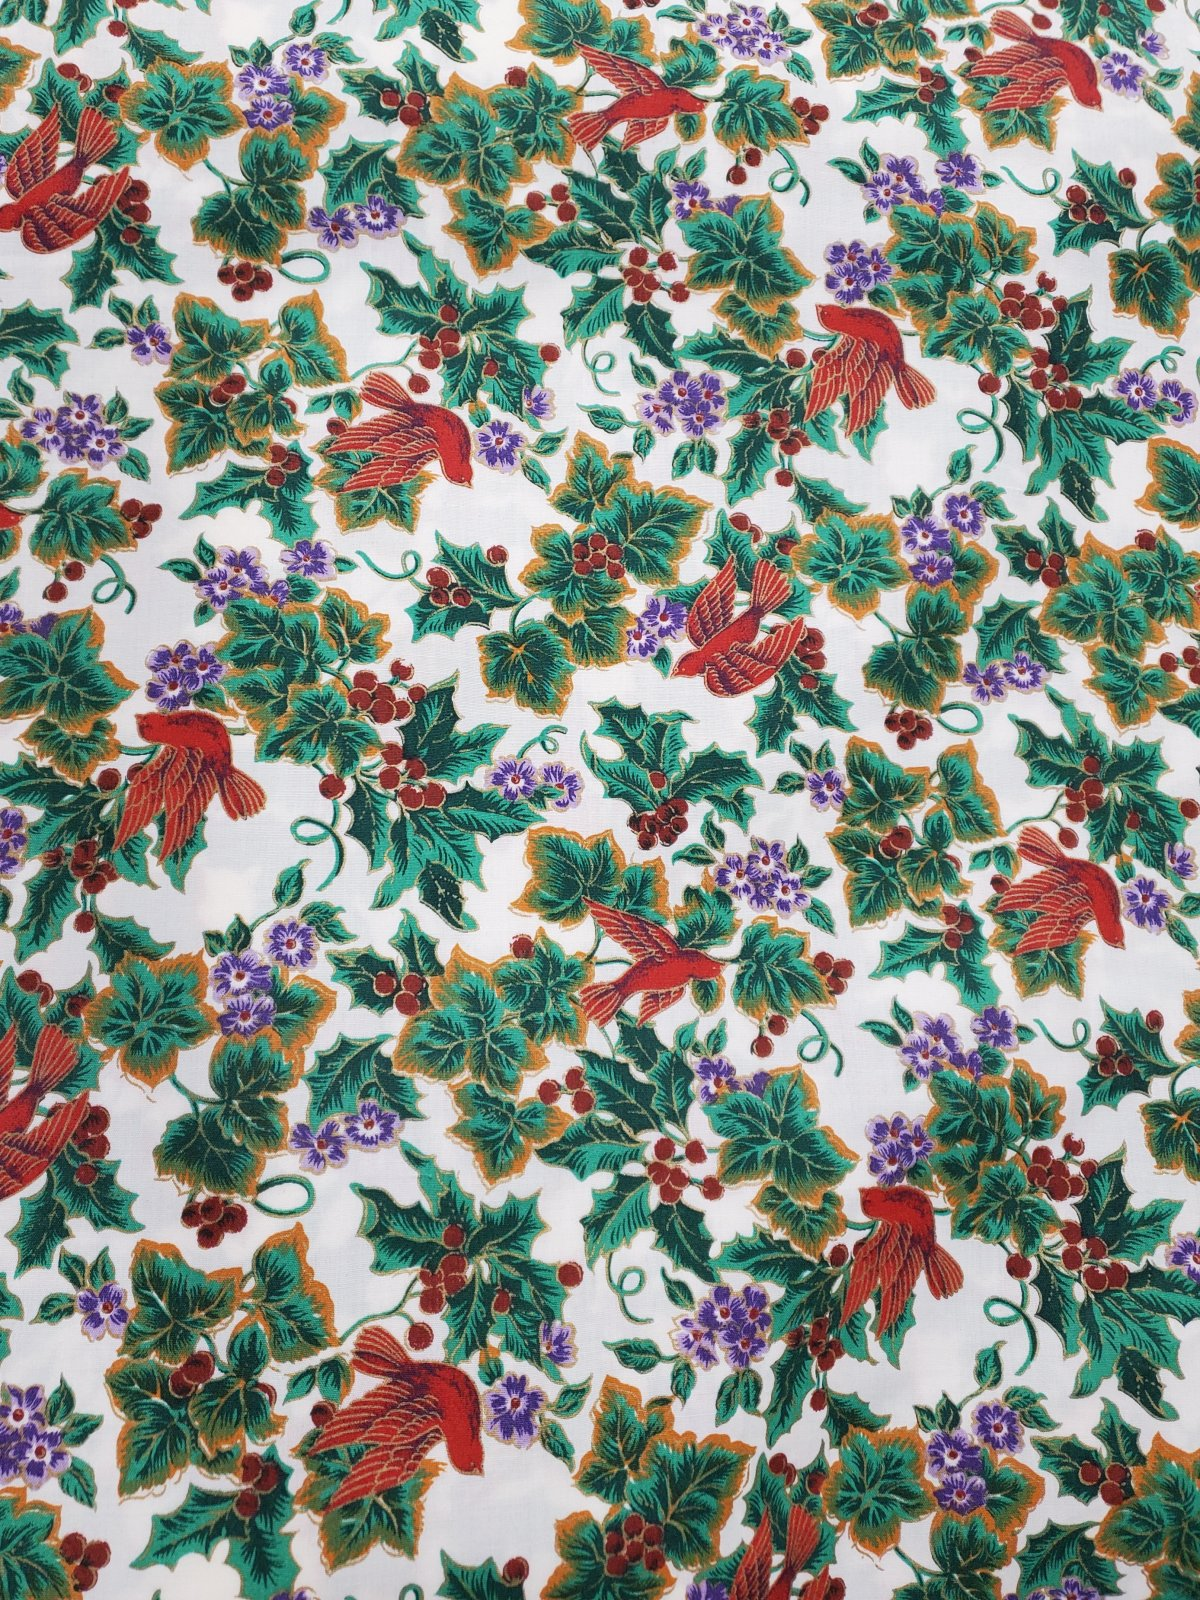 Christmas Mettallie 65%Polyester/35%Cotton 2581/1 20003005